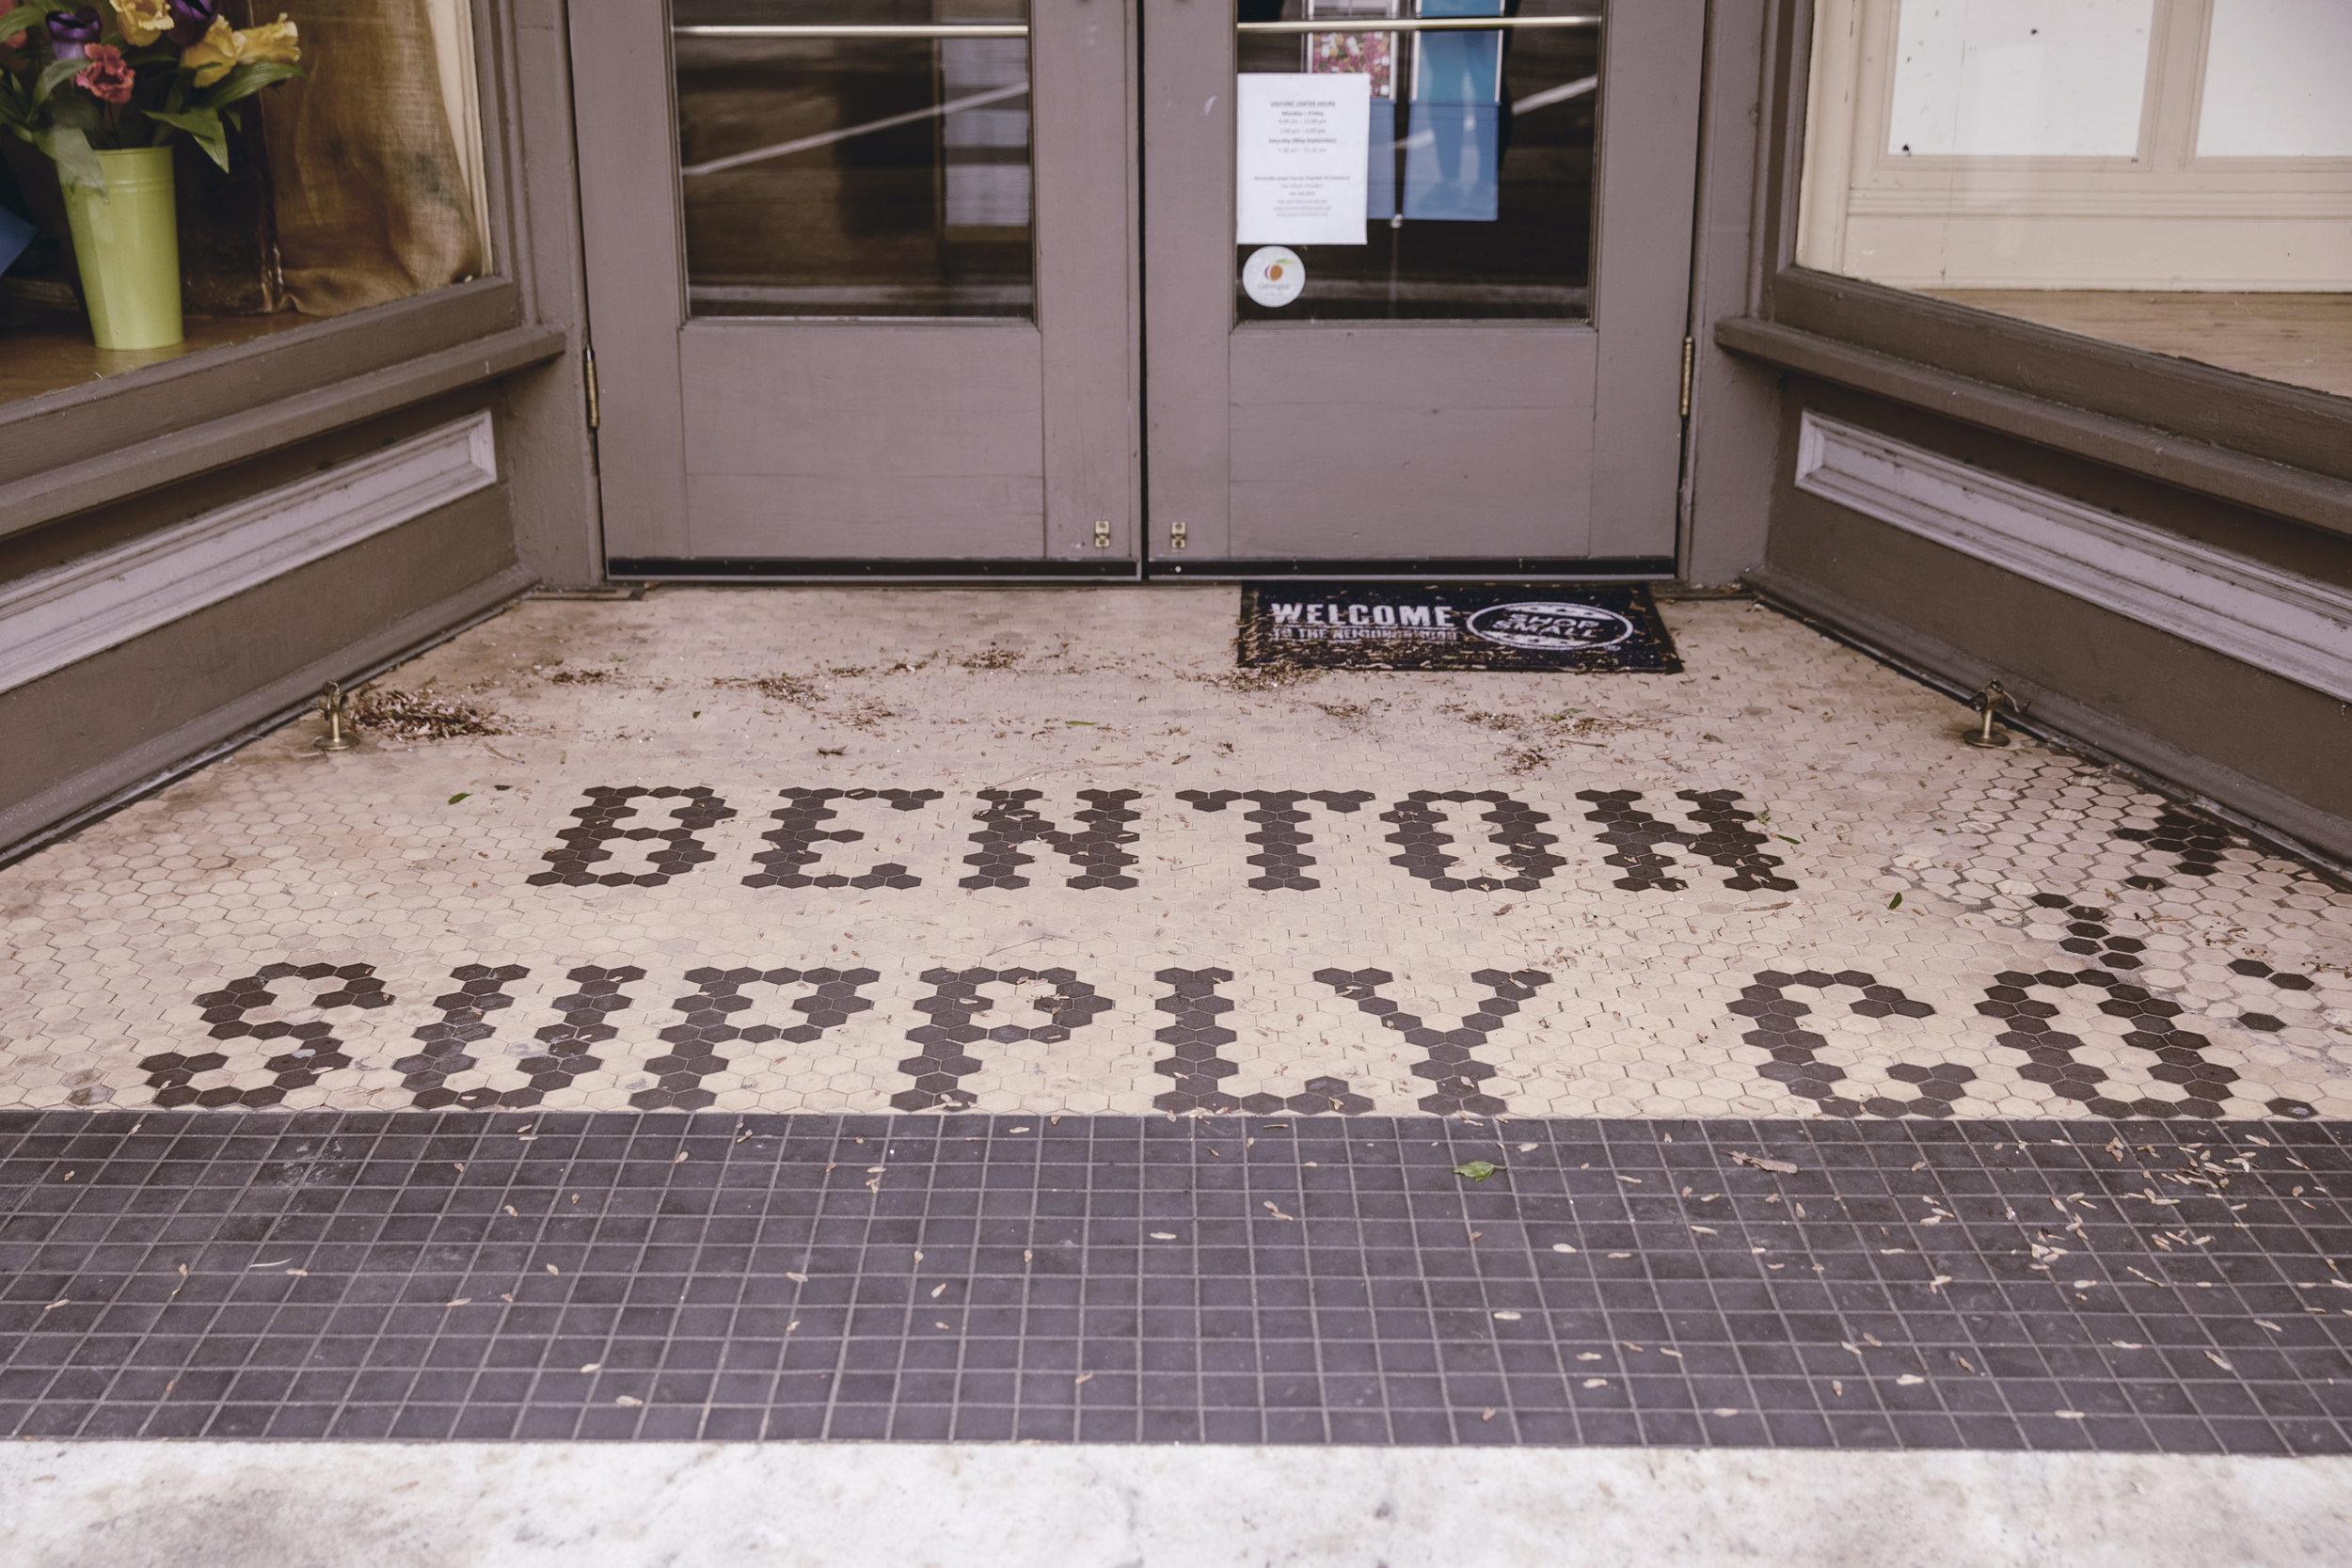 Benton Supply Co floor mosaic / historic storefront in Monticello GA / heirloomed